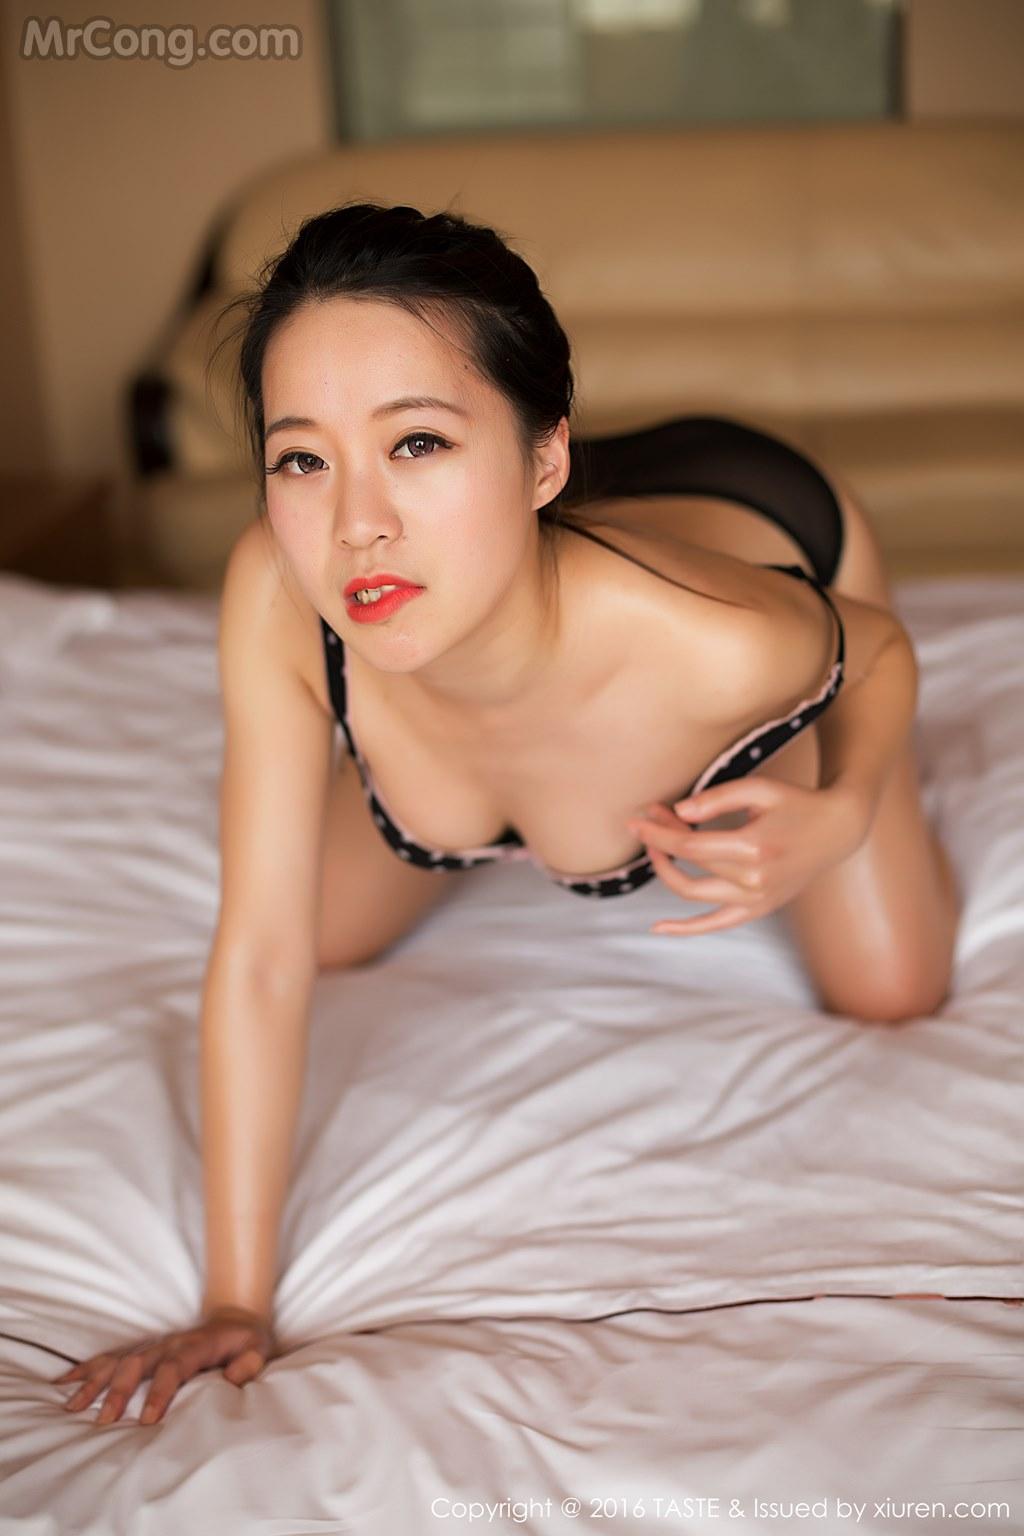 Image MrCong.com-TASTE-Vol.017-NIKO-Xiao-Yue-Yue-001 in post TASTE Vol.017: Người mẫu NIKO (小玥玥) (50 ảnh)